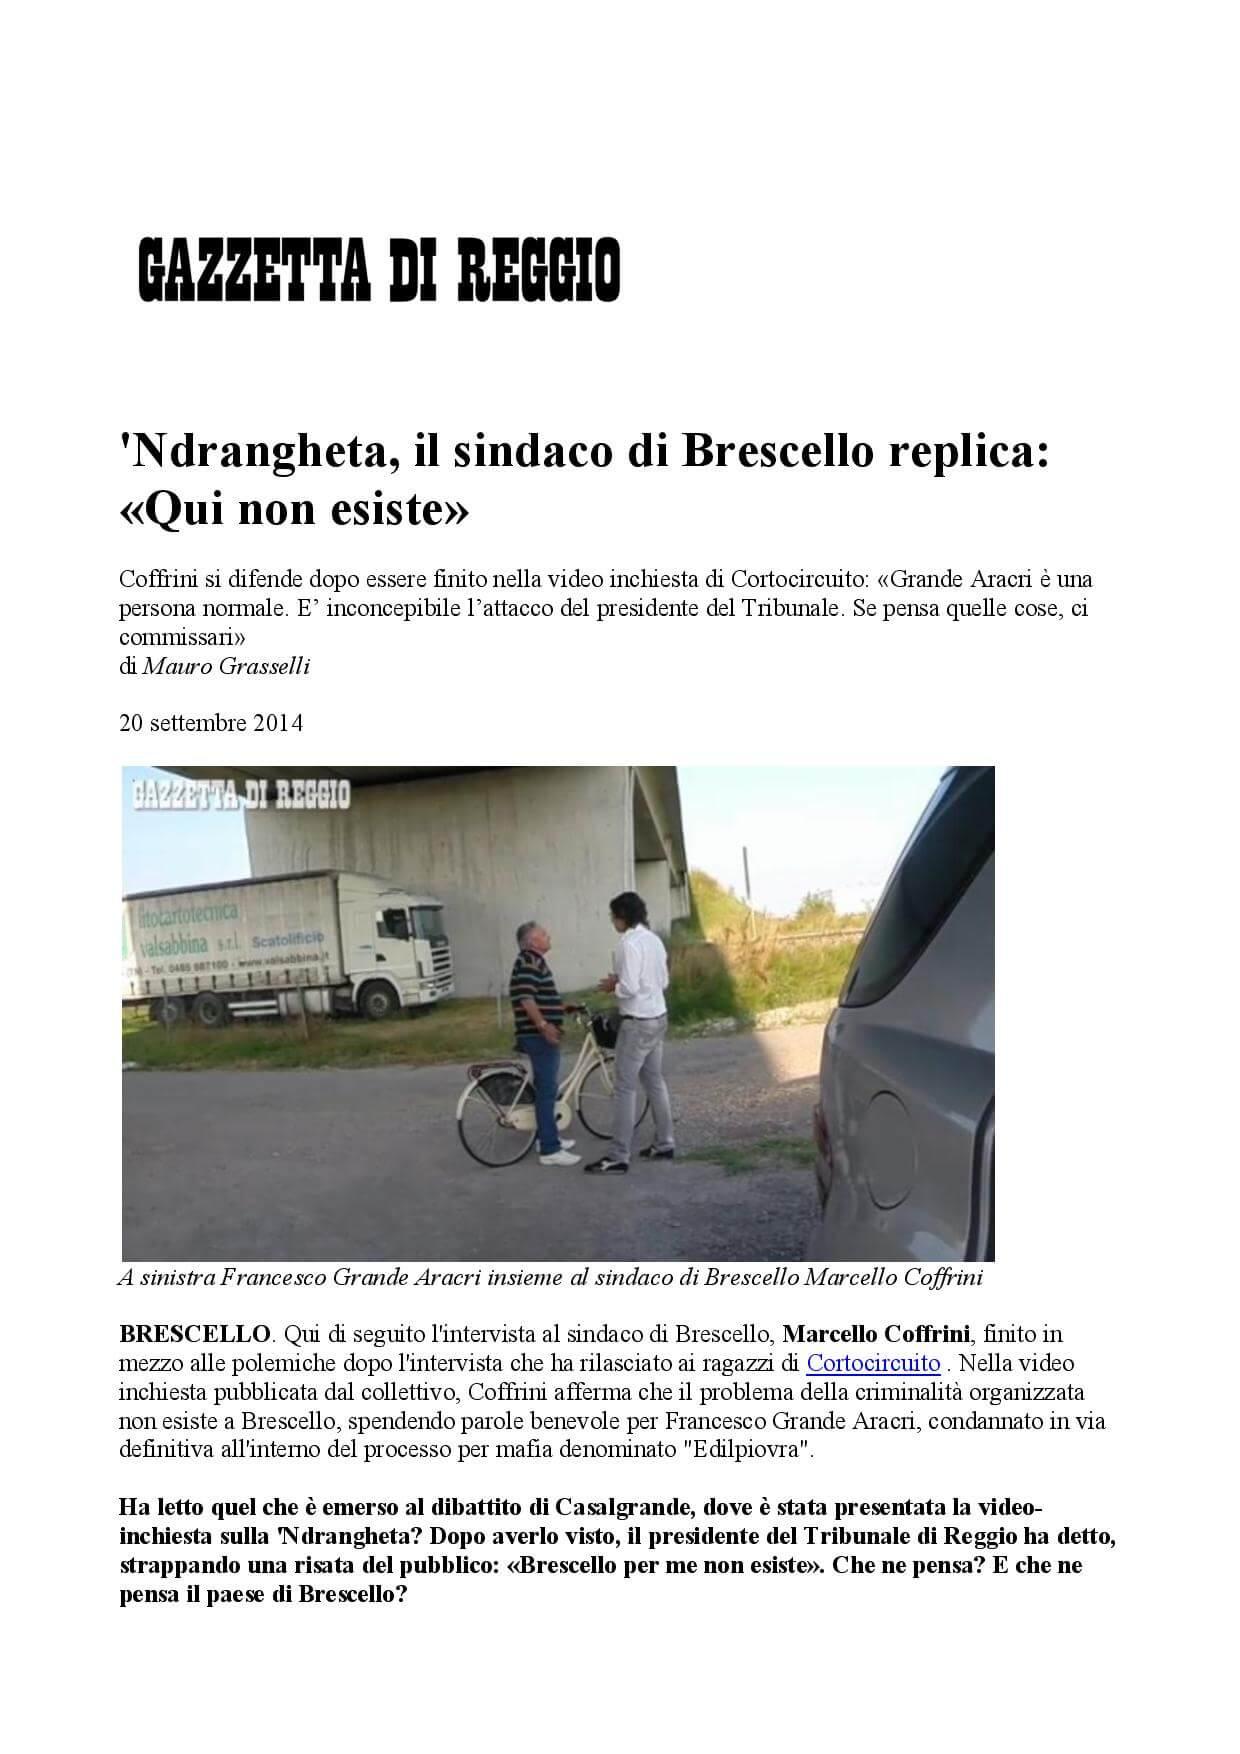 20_9_14_gdr_grasselli-1-page-001